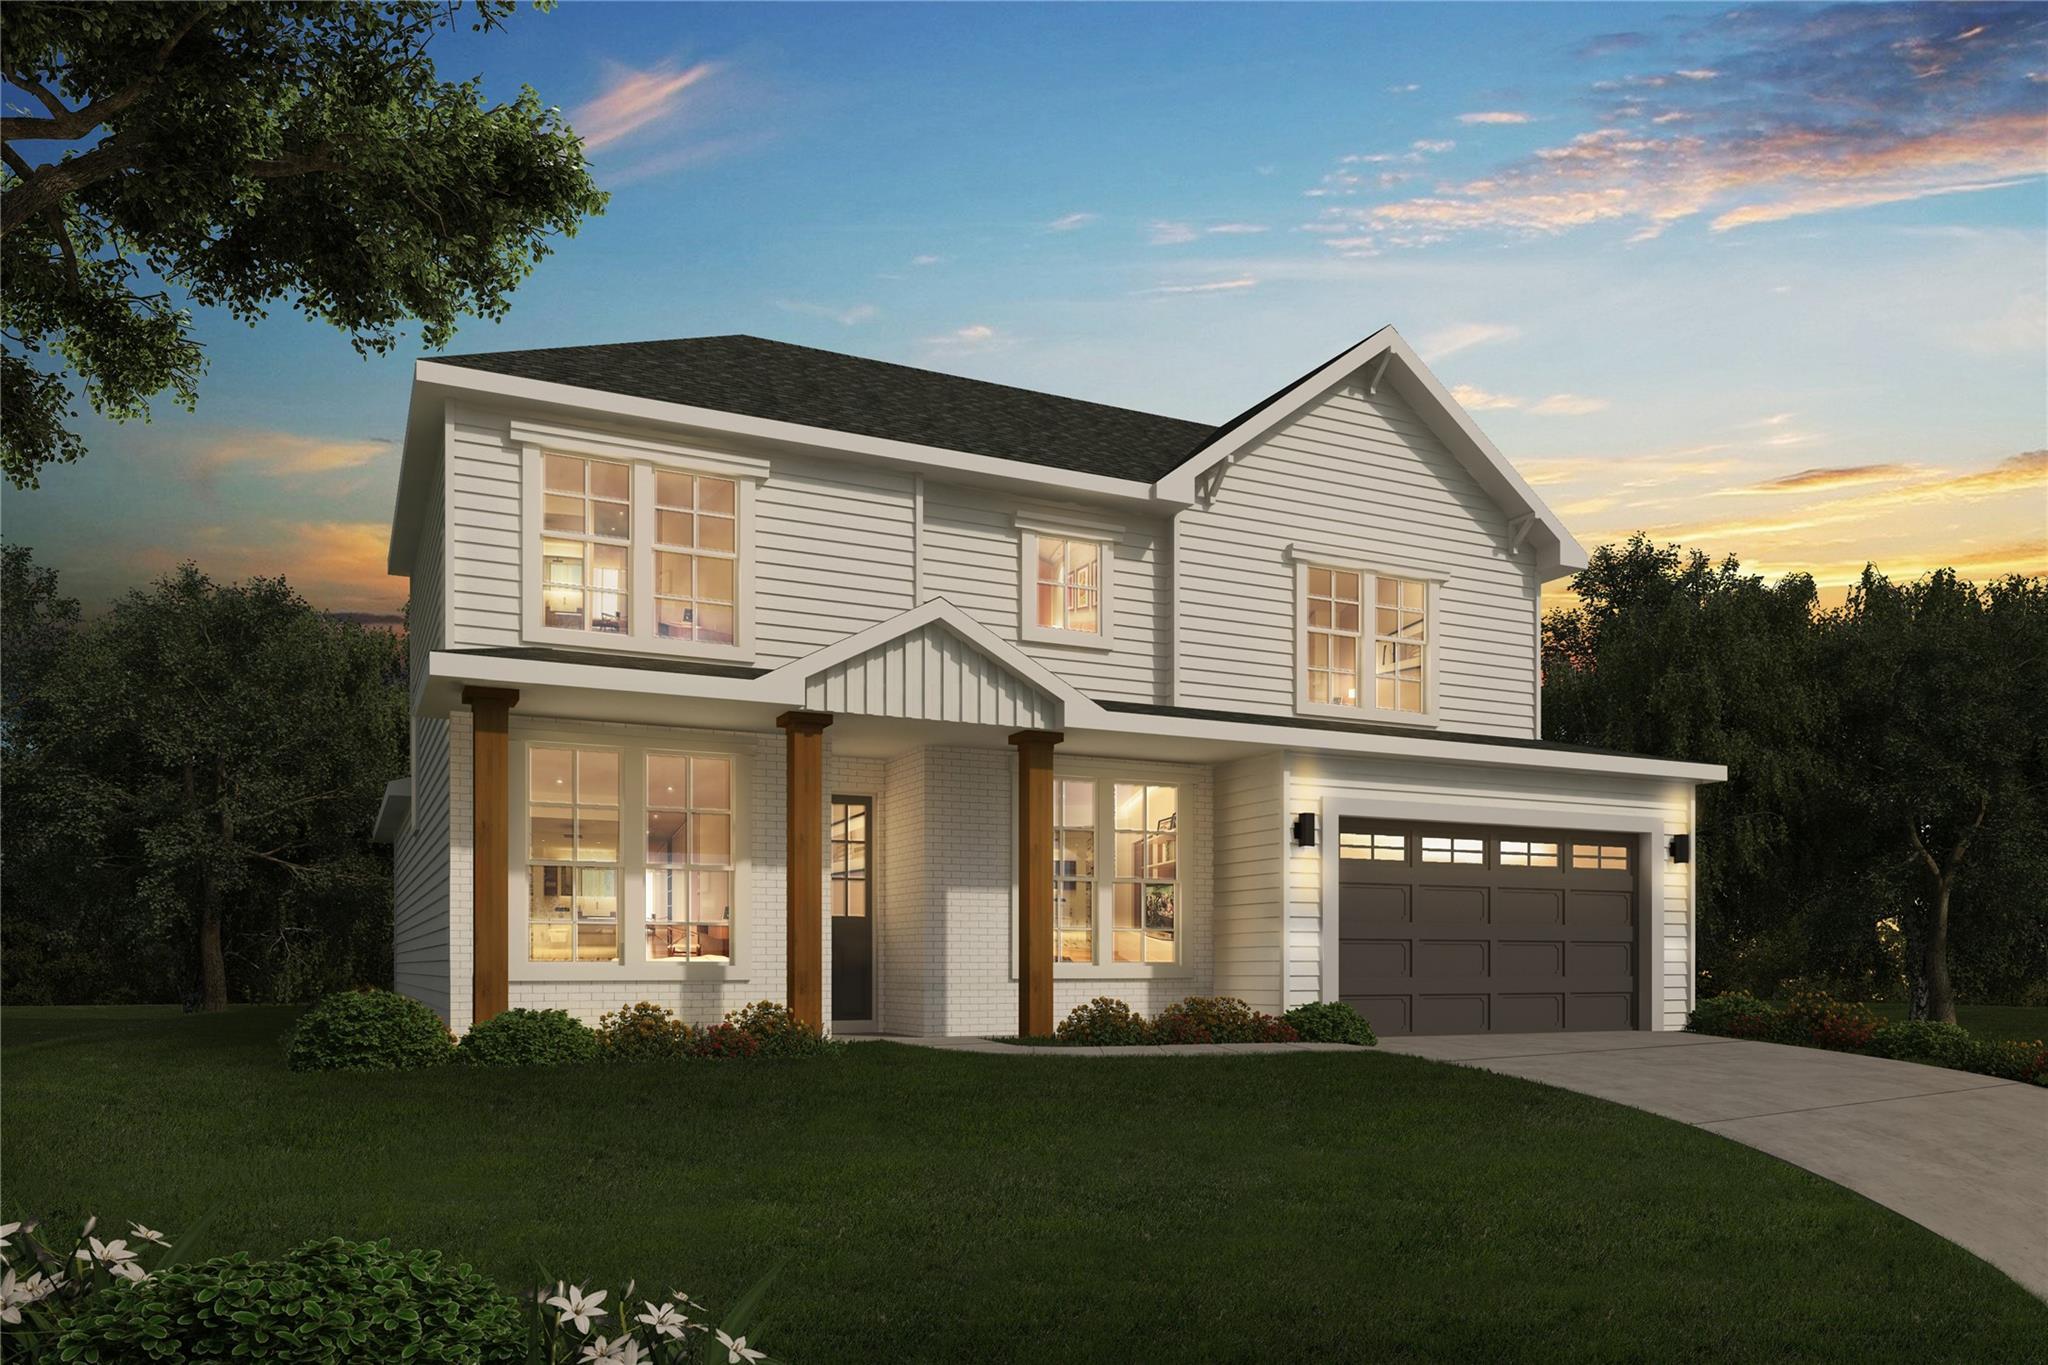 4516 De Lange Property Photo - Houston, TX real estate listing